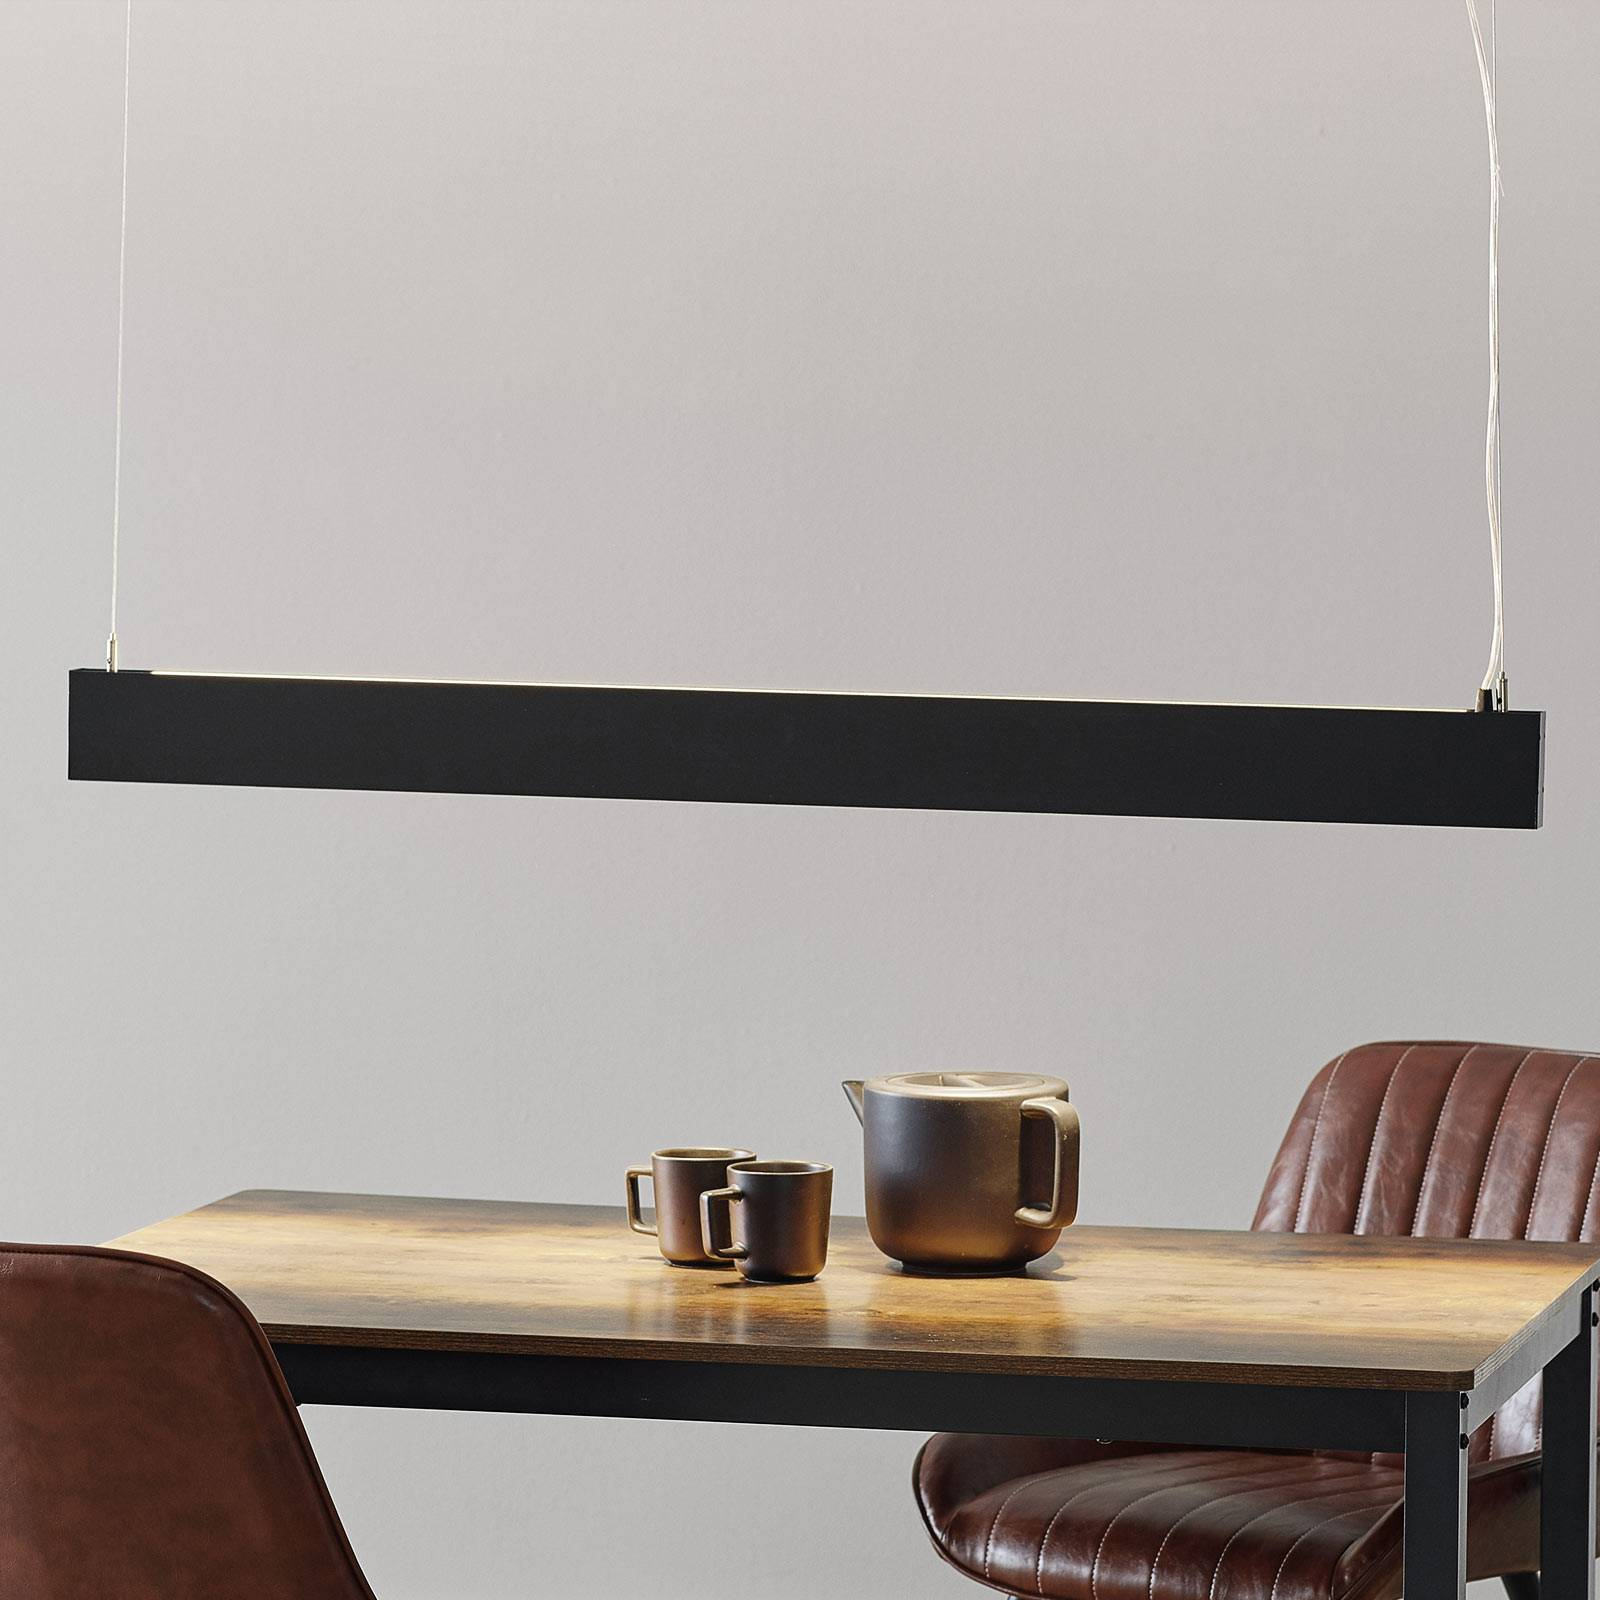 LED-riippuvalaisin Tango, up- and downlight